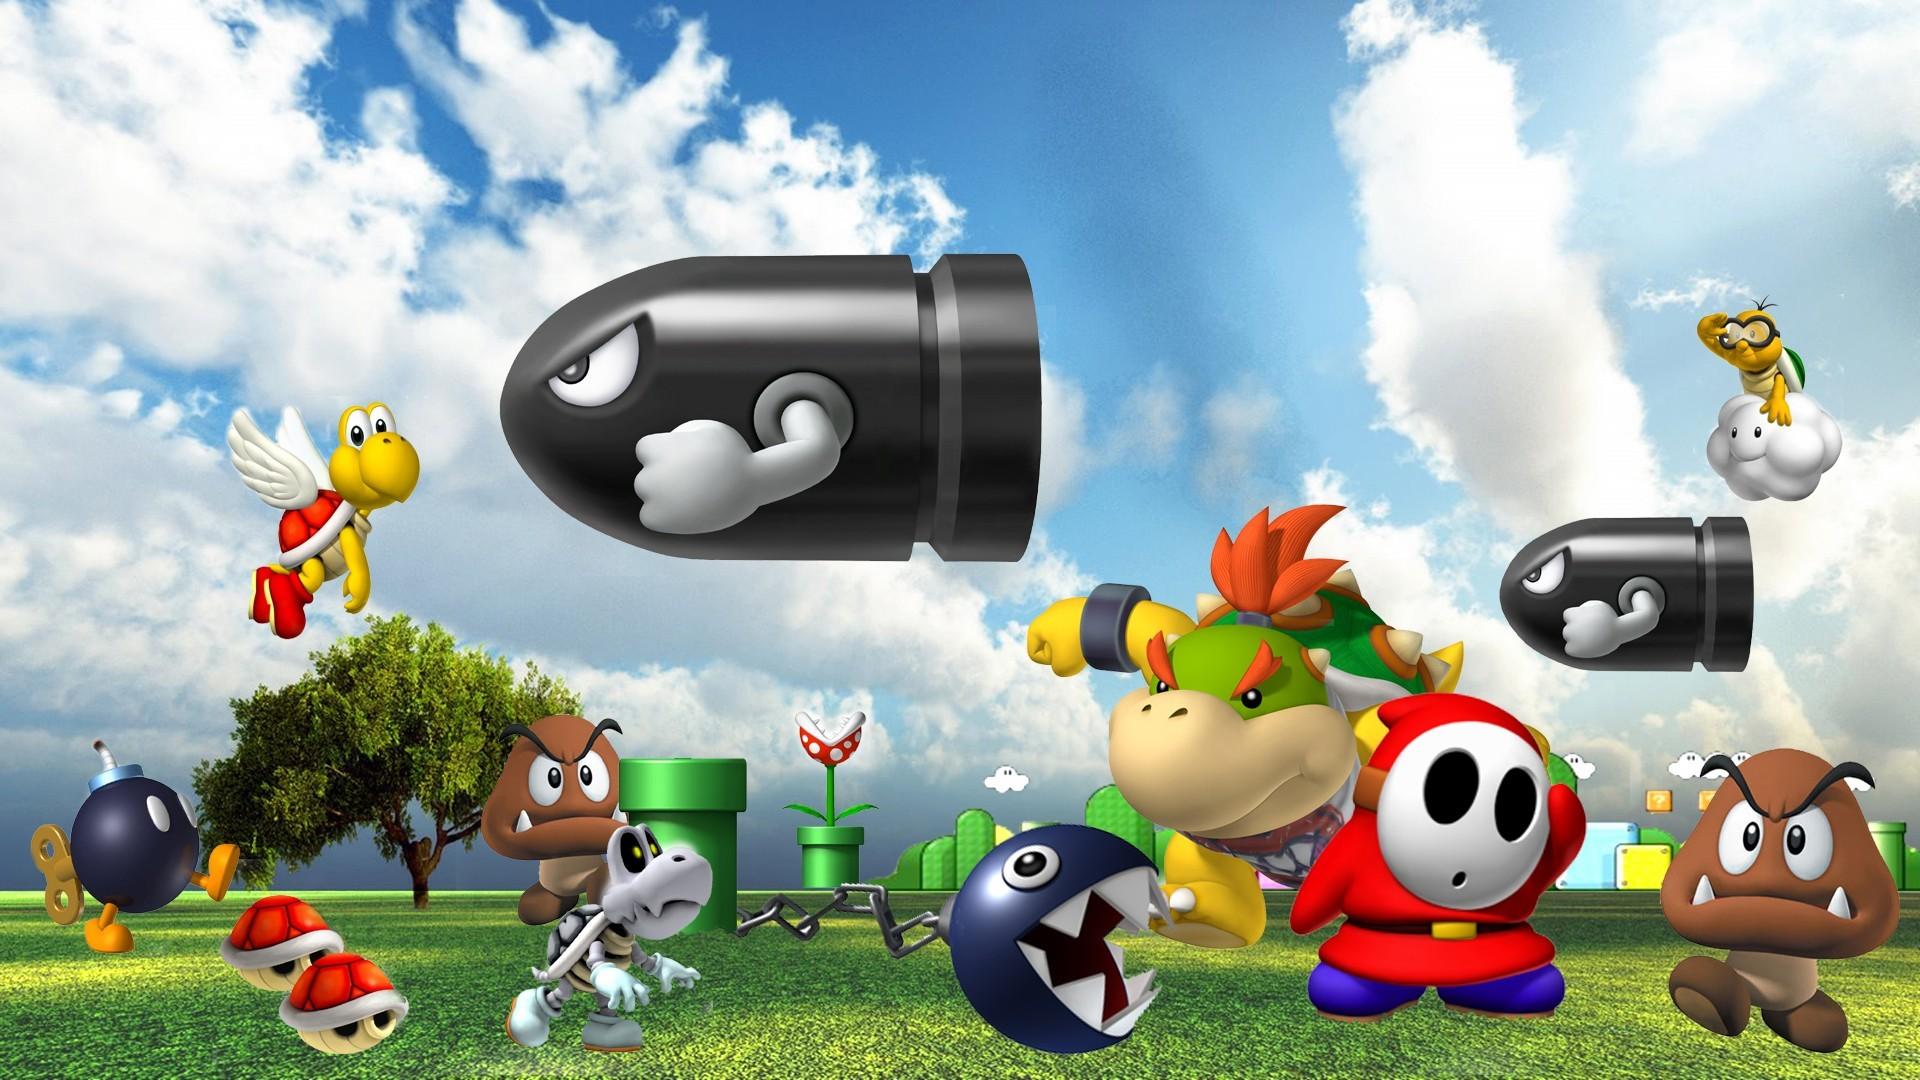 Video Game – Super Mario 64 Bullet Bill Chain Chomp Koopa Troopa Shy Guy  Piranha Plant